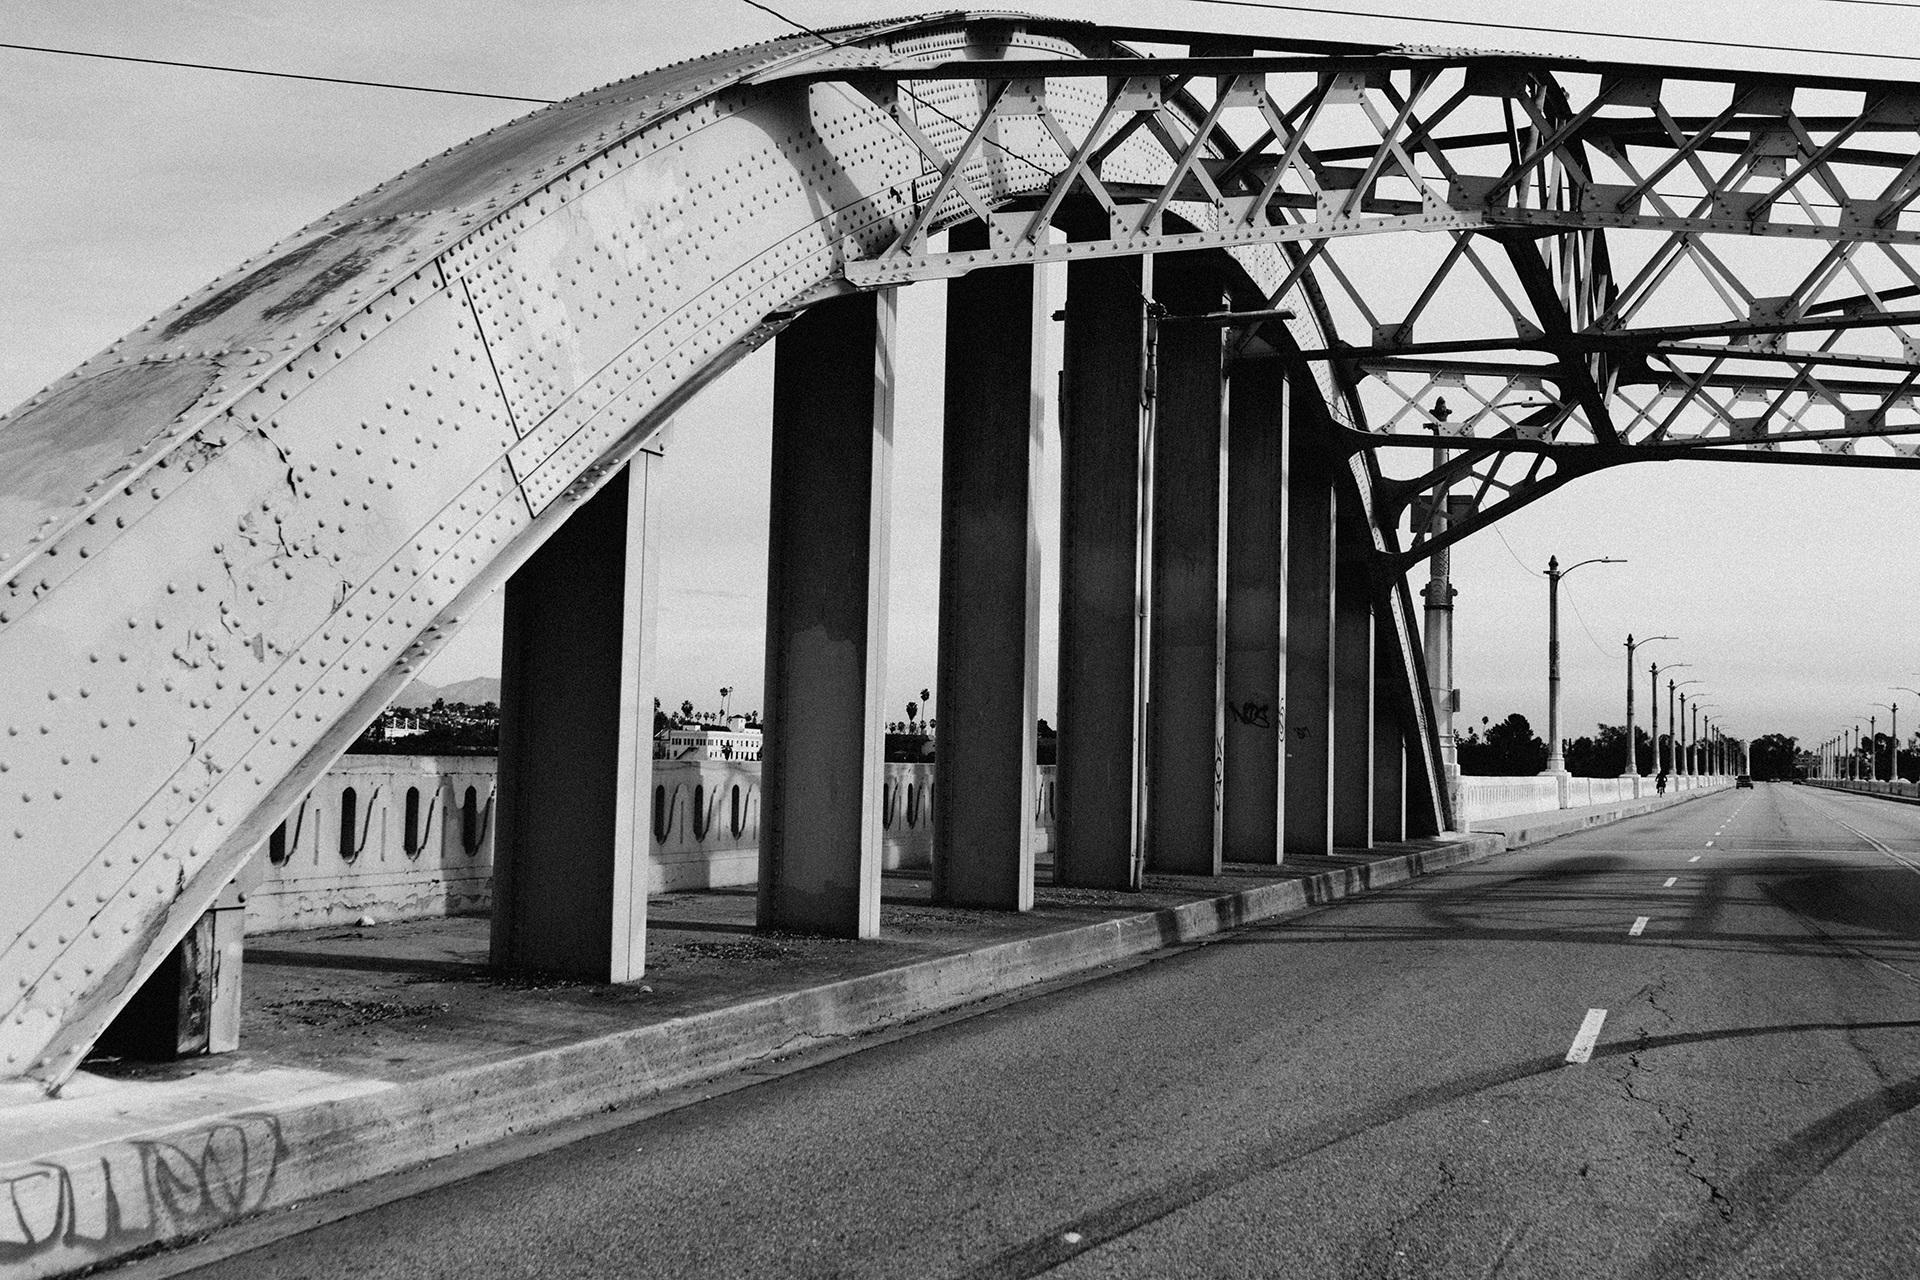 Free images black and white architecture road bridge for Architecture noir et blanc